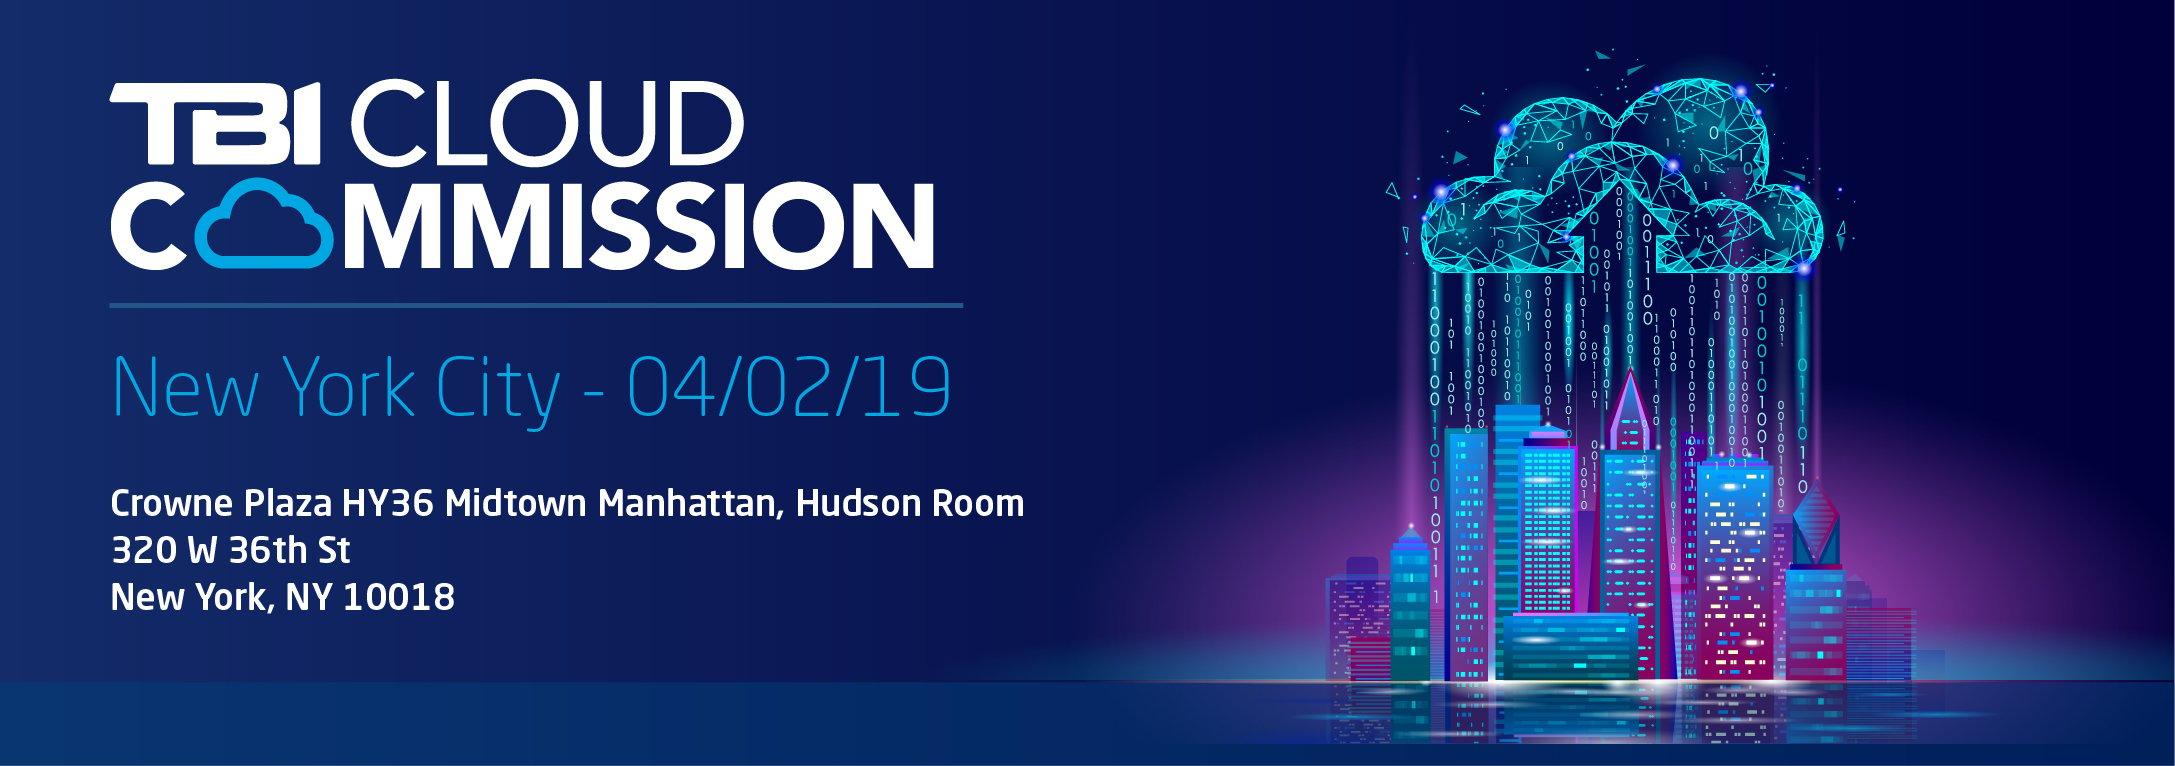 TBI Cloud Commission NYC 01/02/19